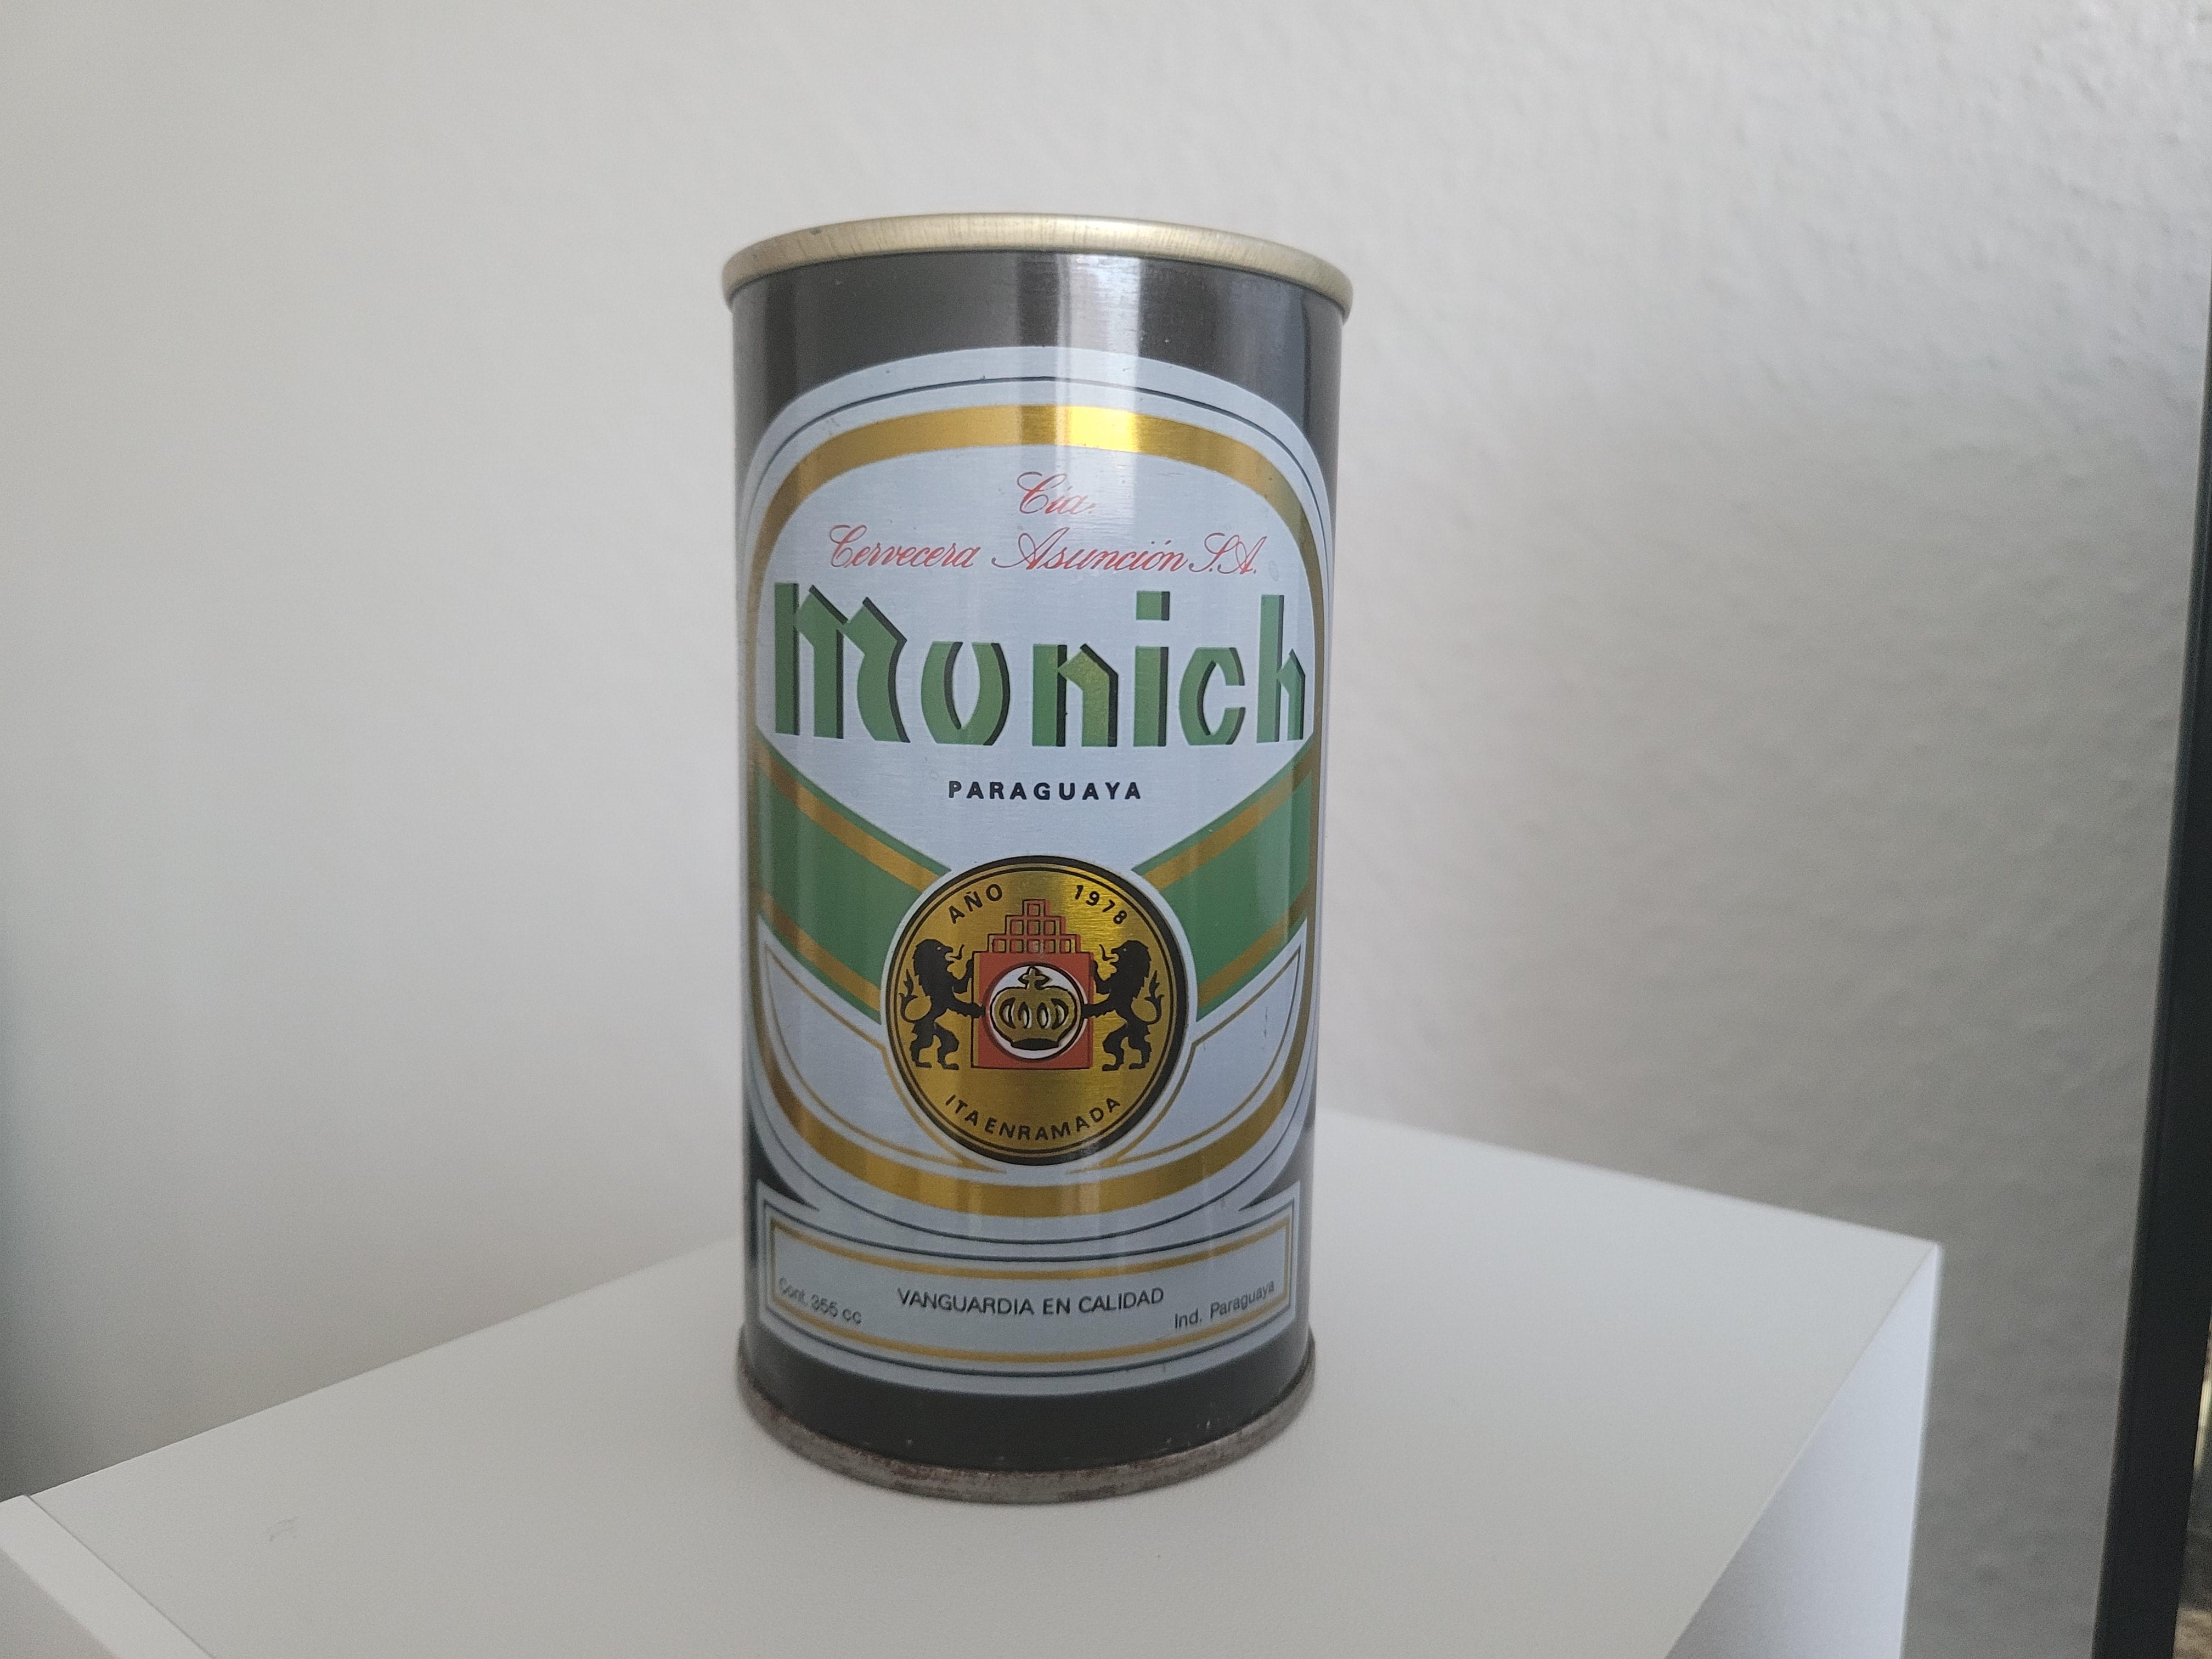 munich_bier_paraguay